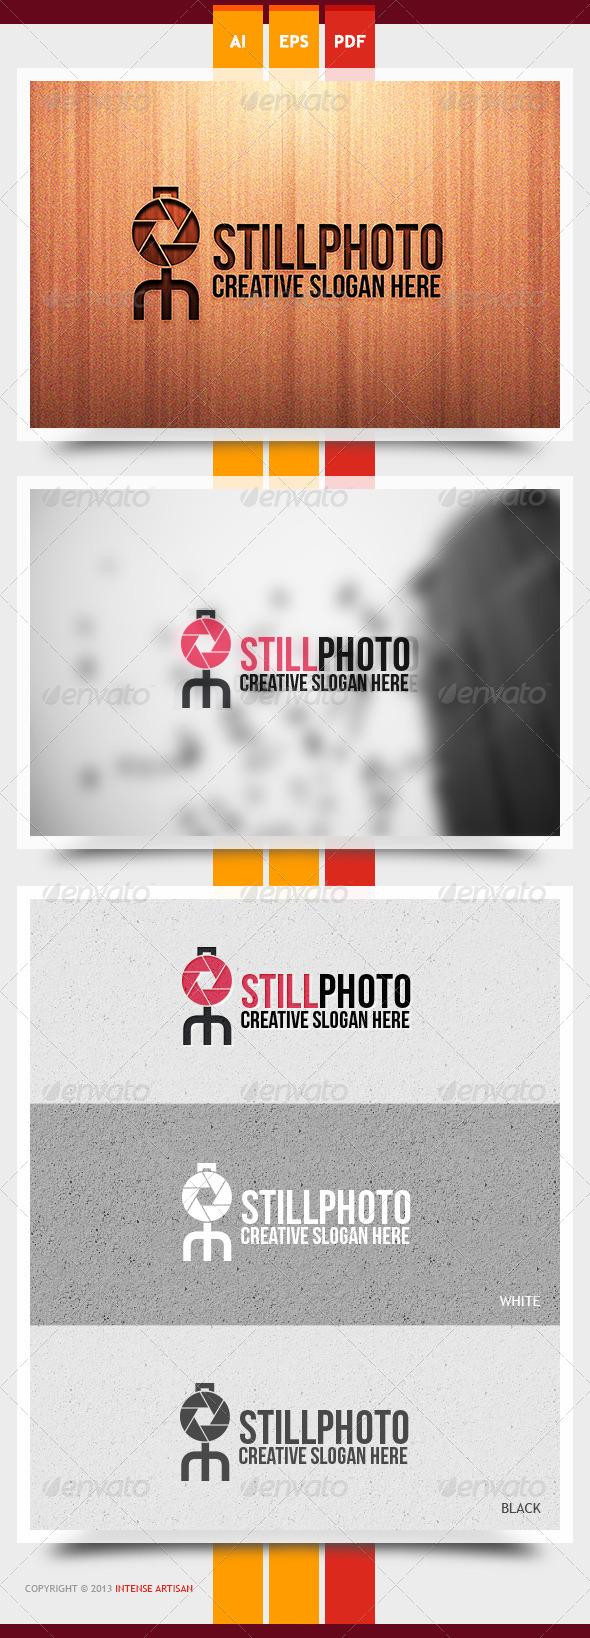 Still Photo Logo Template - Objects Logo Templates